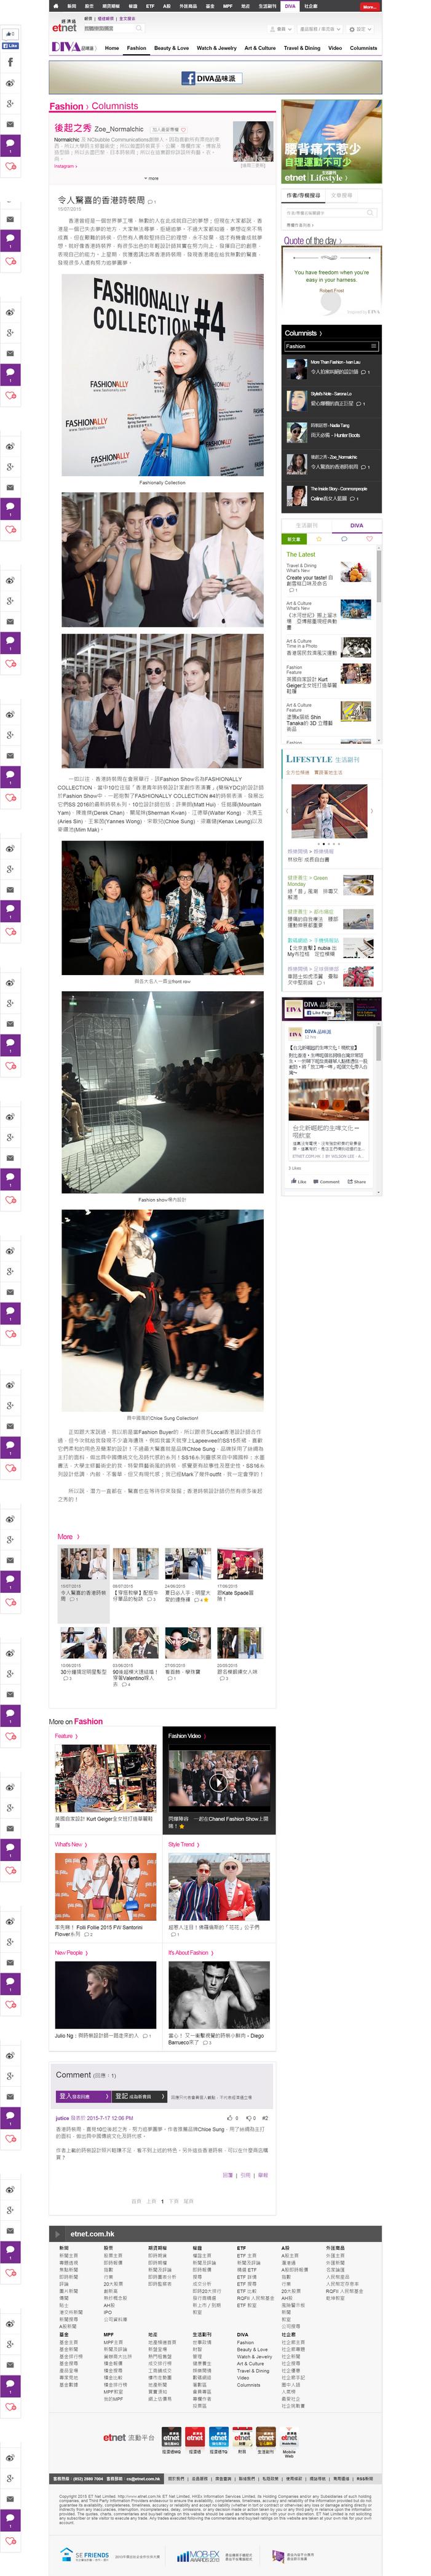 ETnet經濟通 - Fashionally 4.0 NECRO POON 16 collection